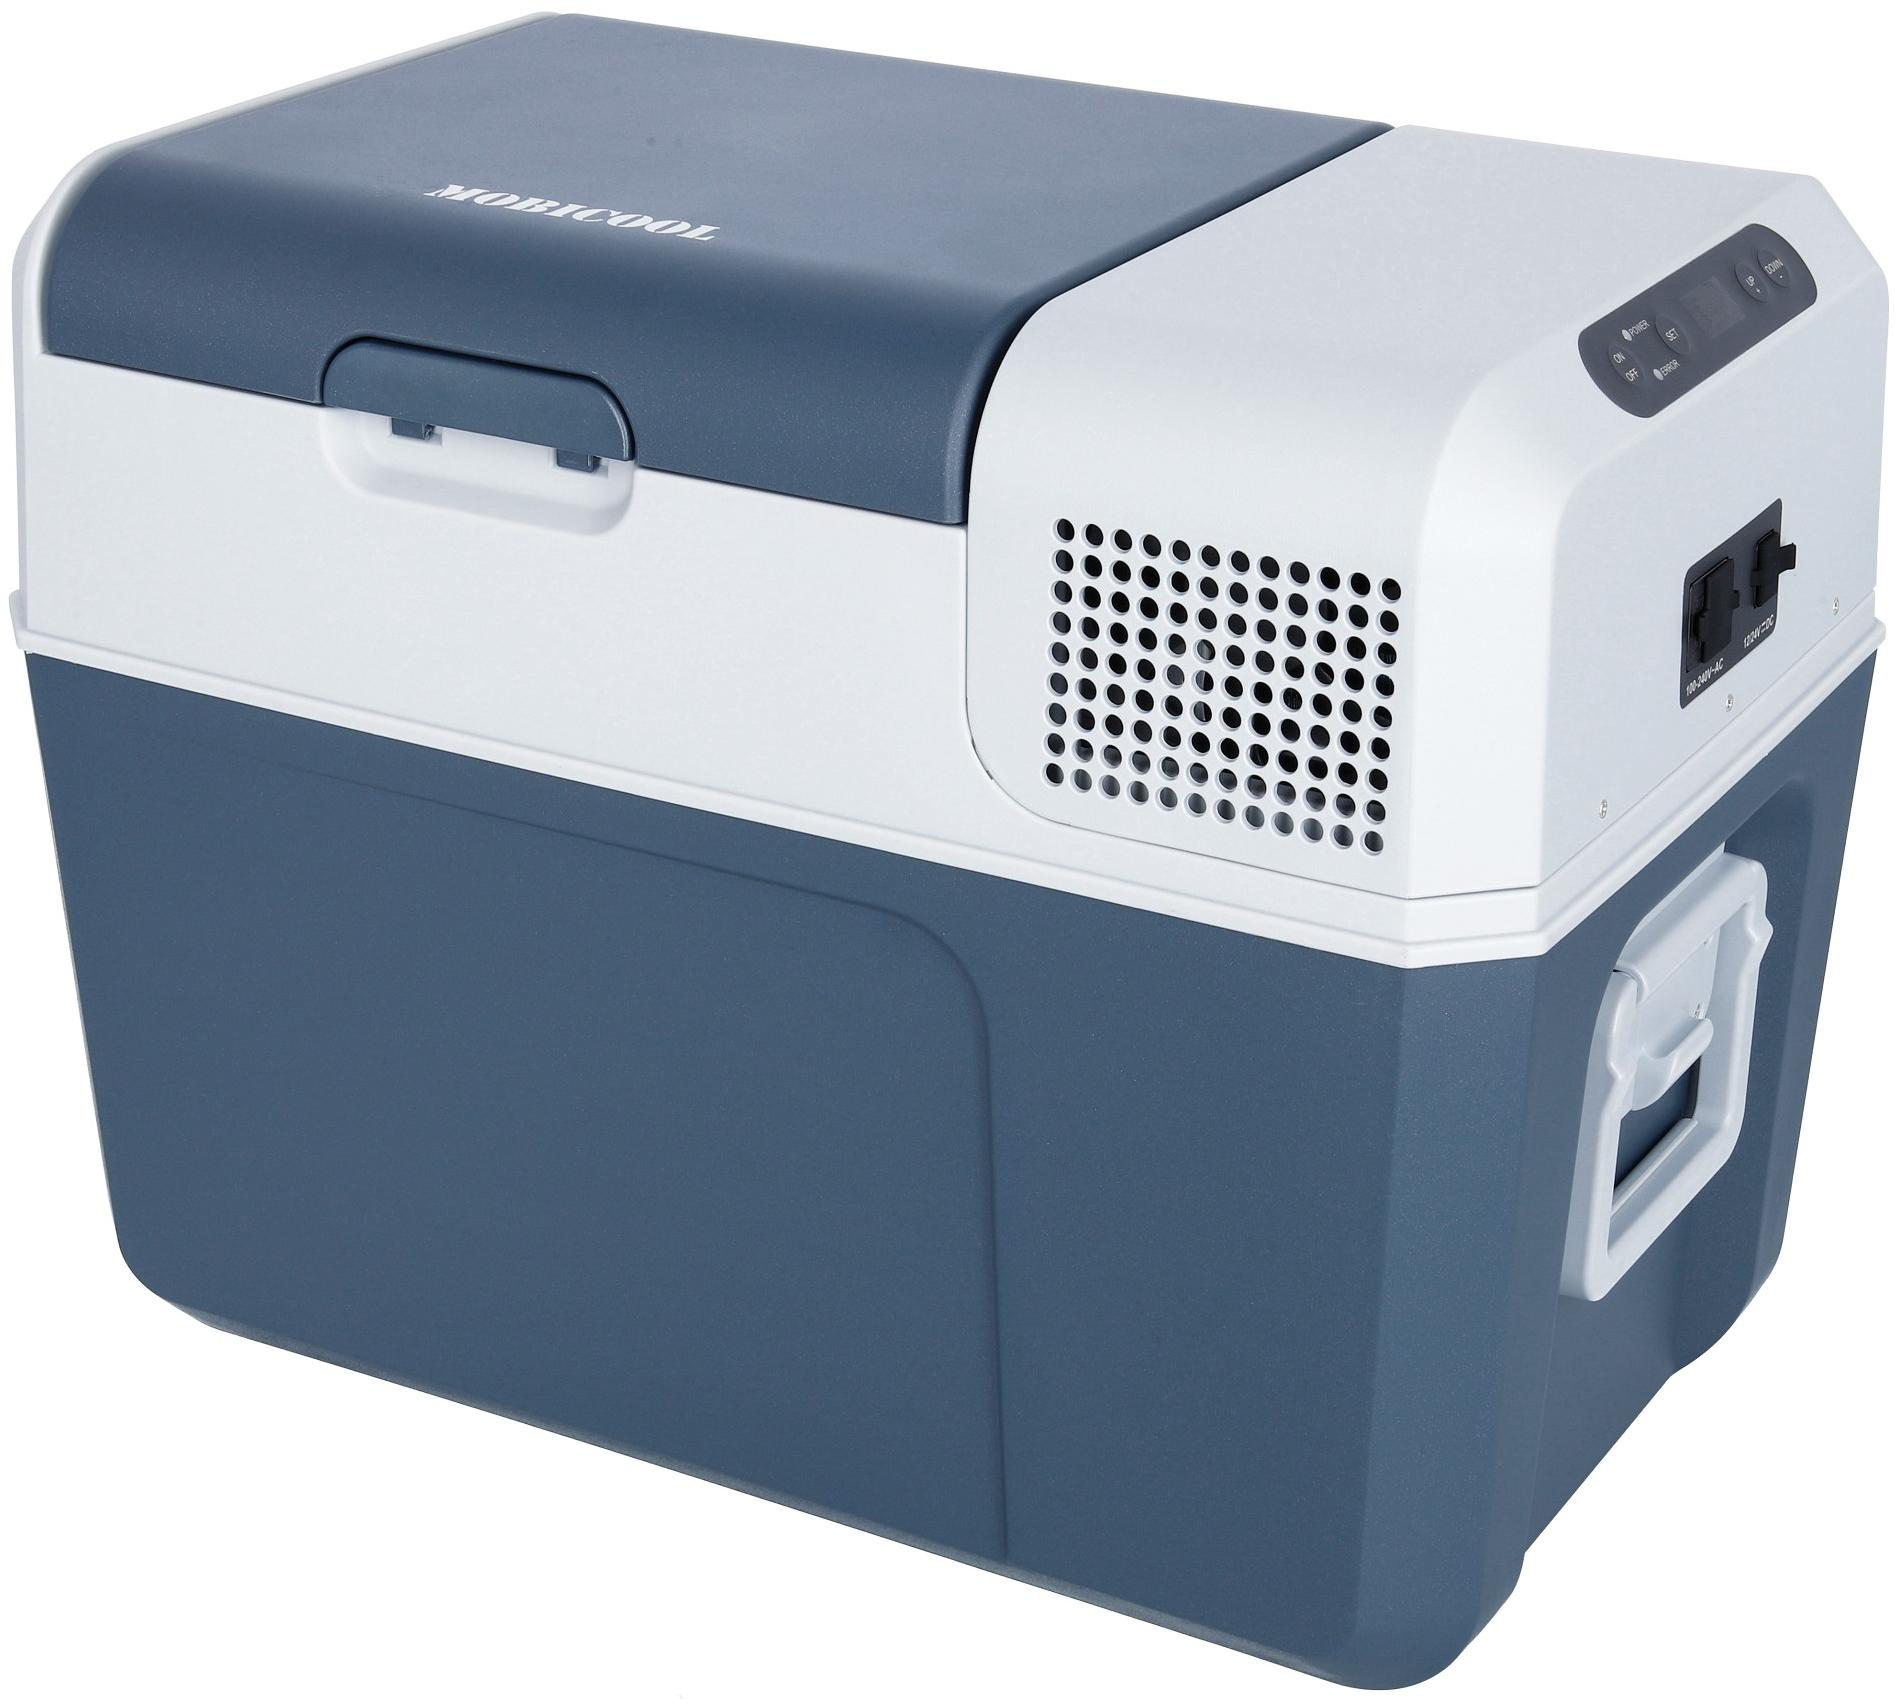 Kompressor-Kühlbox im Wohnmobil